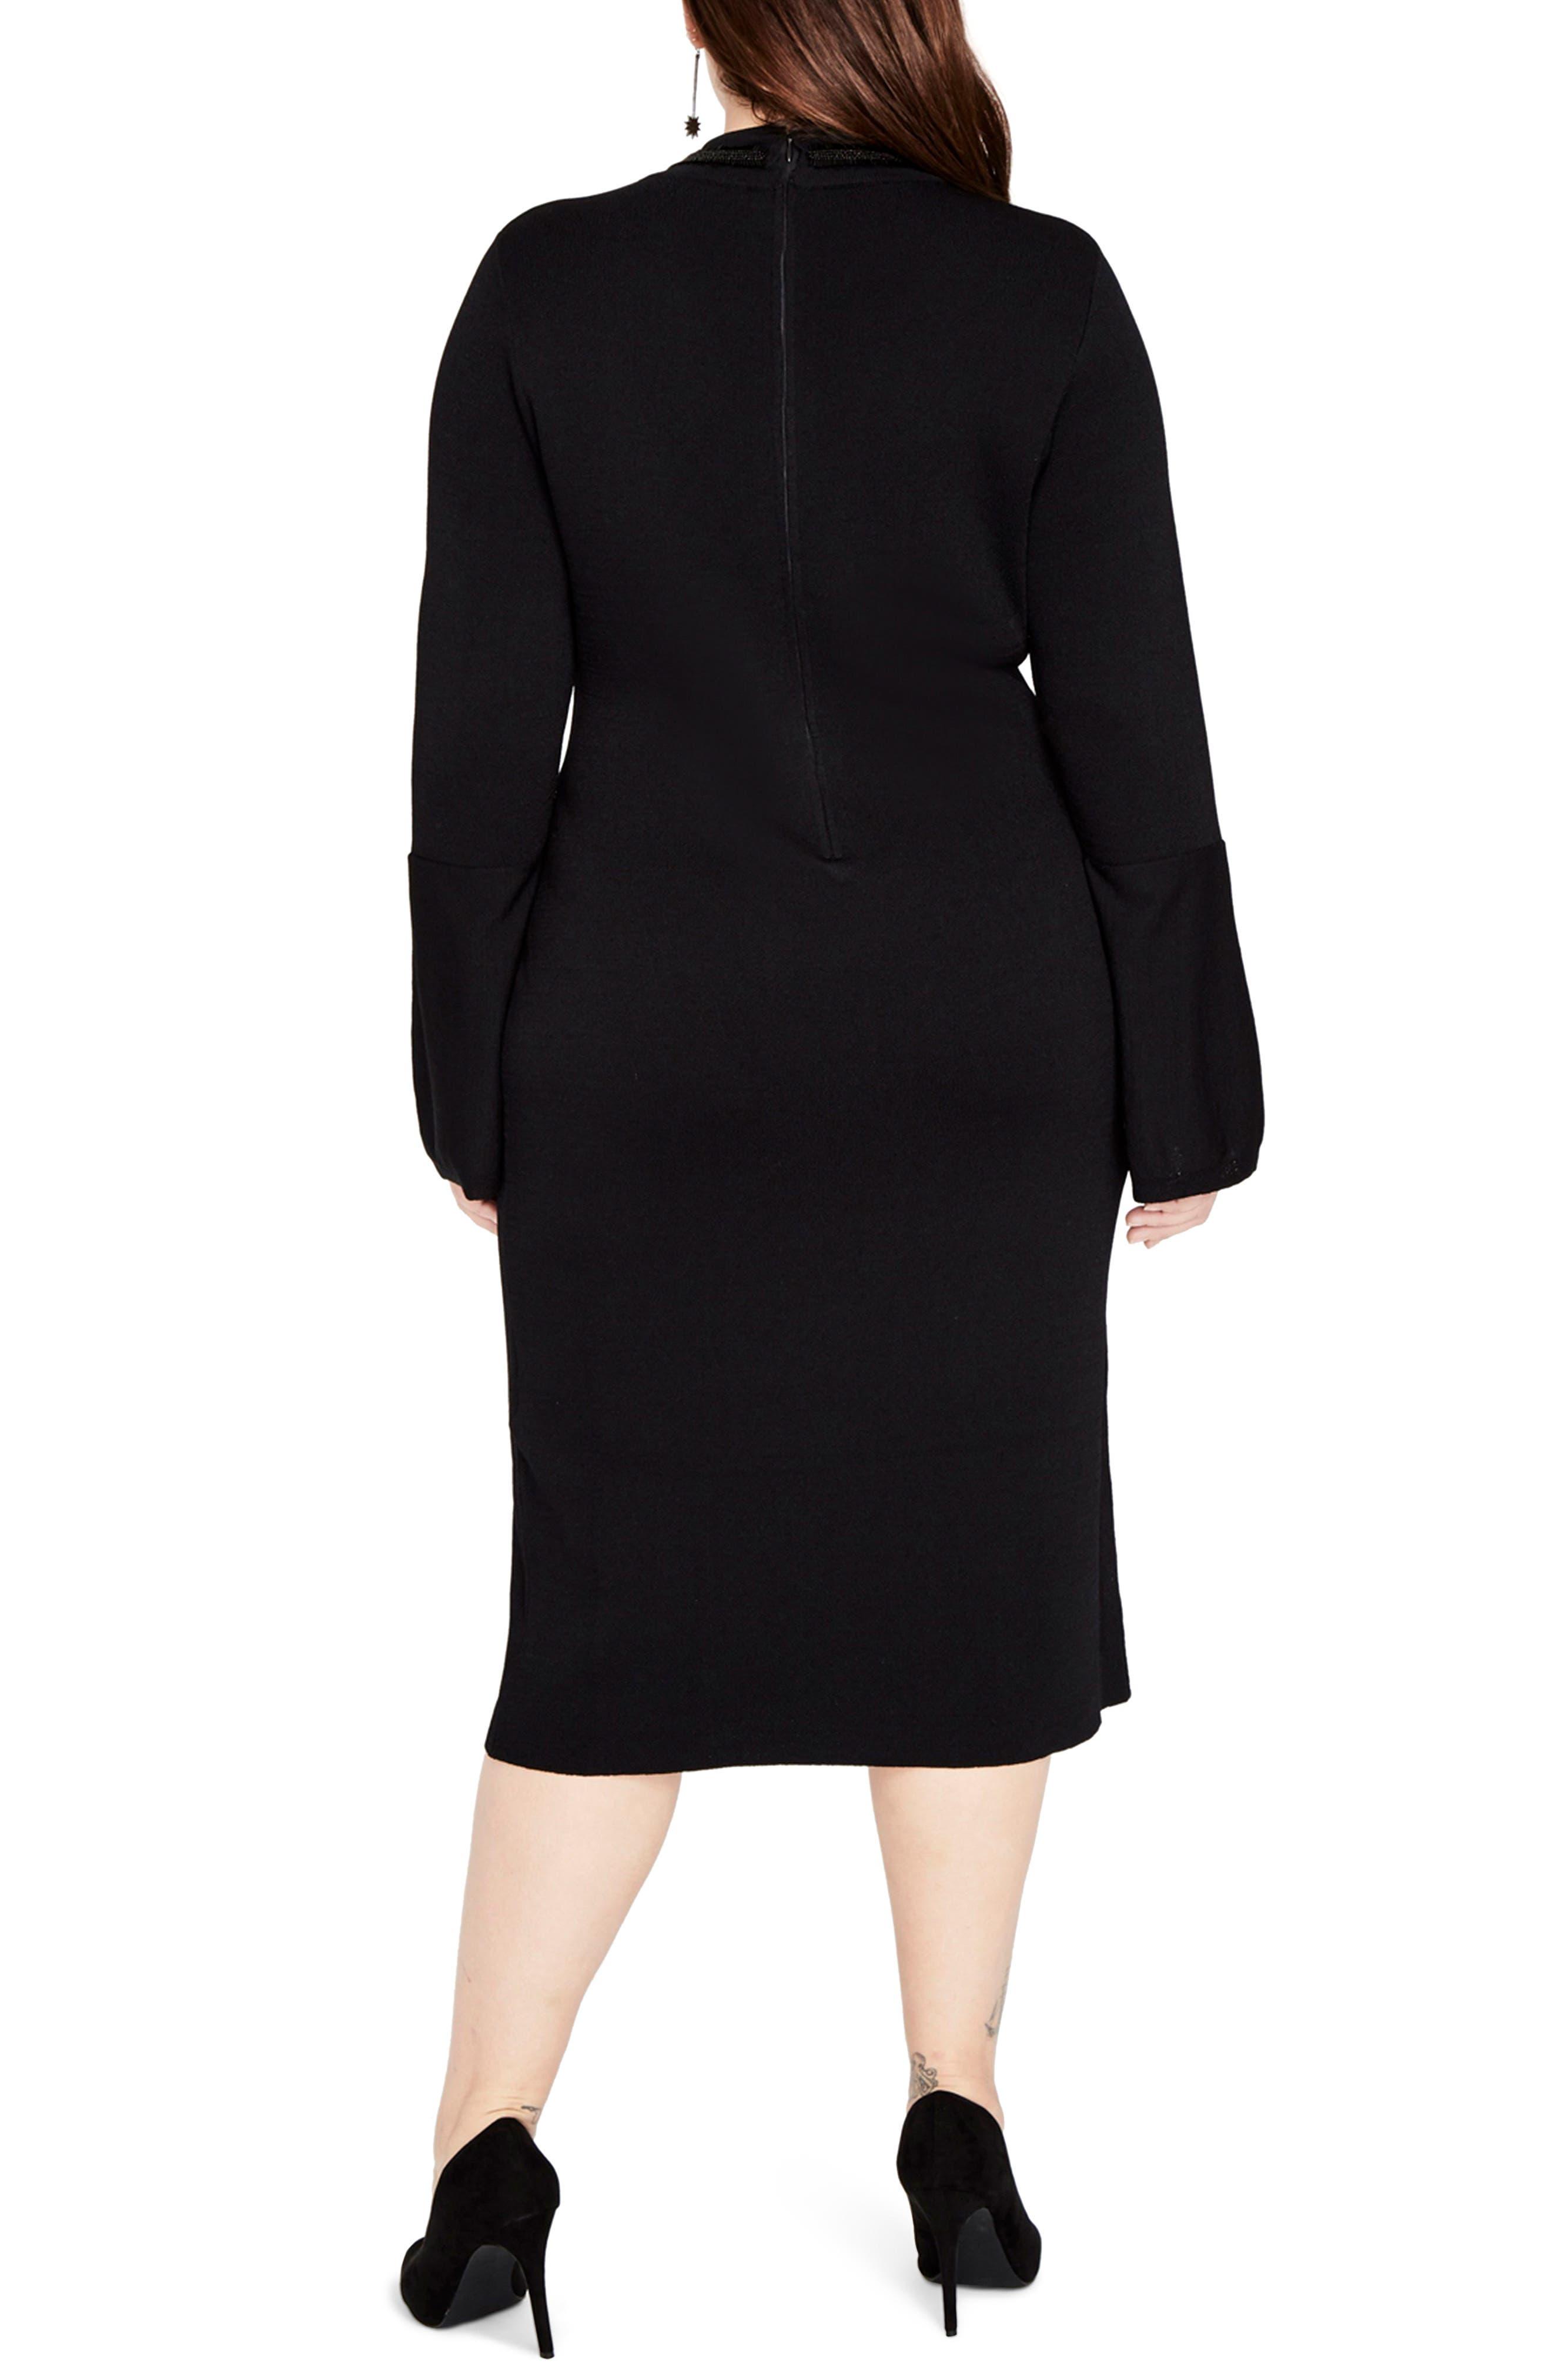 RACHEL RACHEL ROY,                             Choker Neck Sweater Dress,                             Alternate thumbnail 2, color,                             001